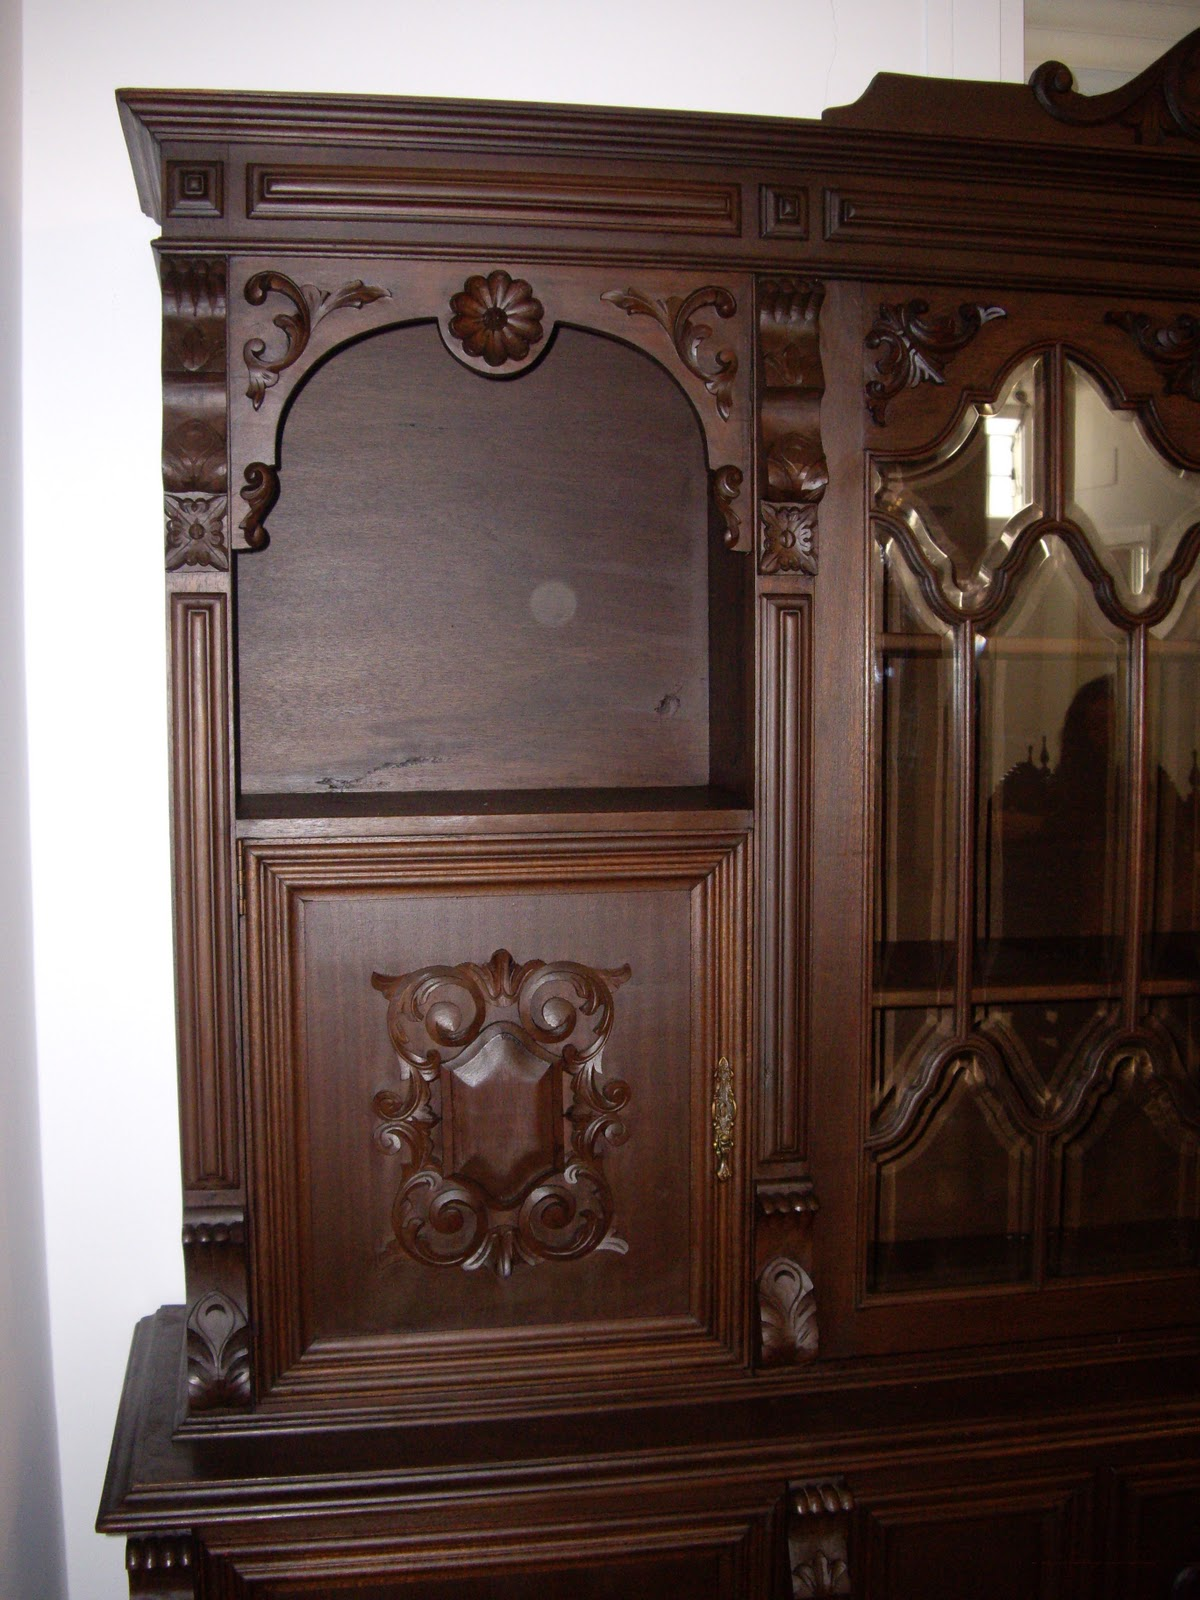 Antiguedades muebles de salon antiguo con mesa de comedor for Muebles de comedor antiguos